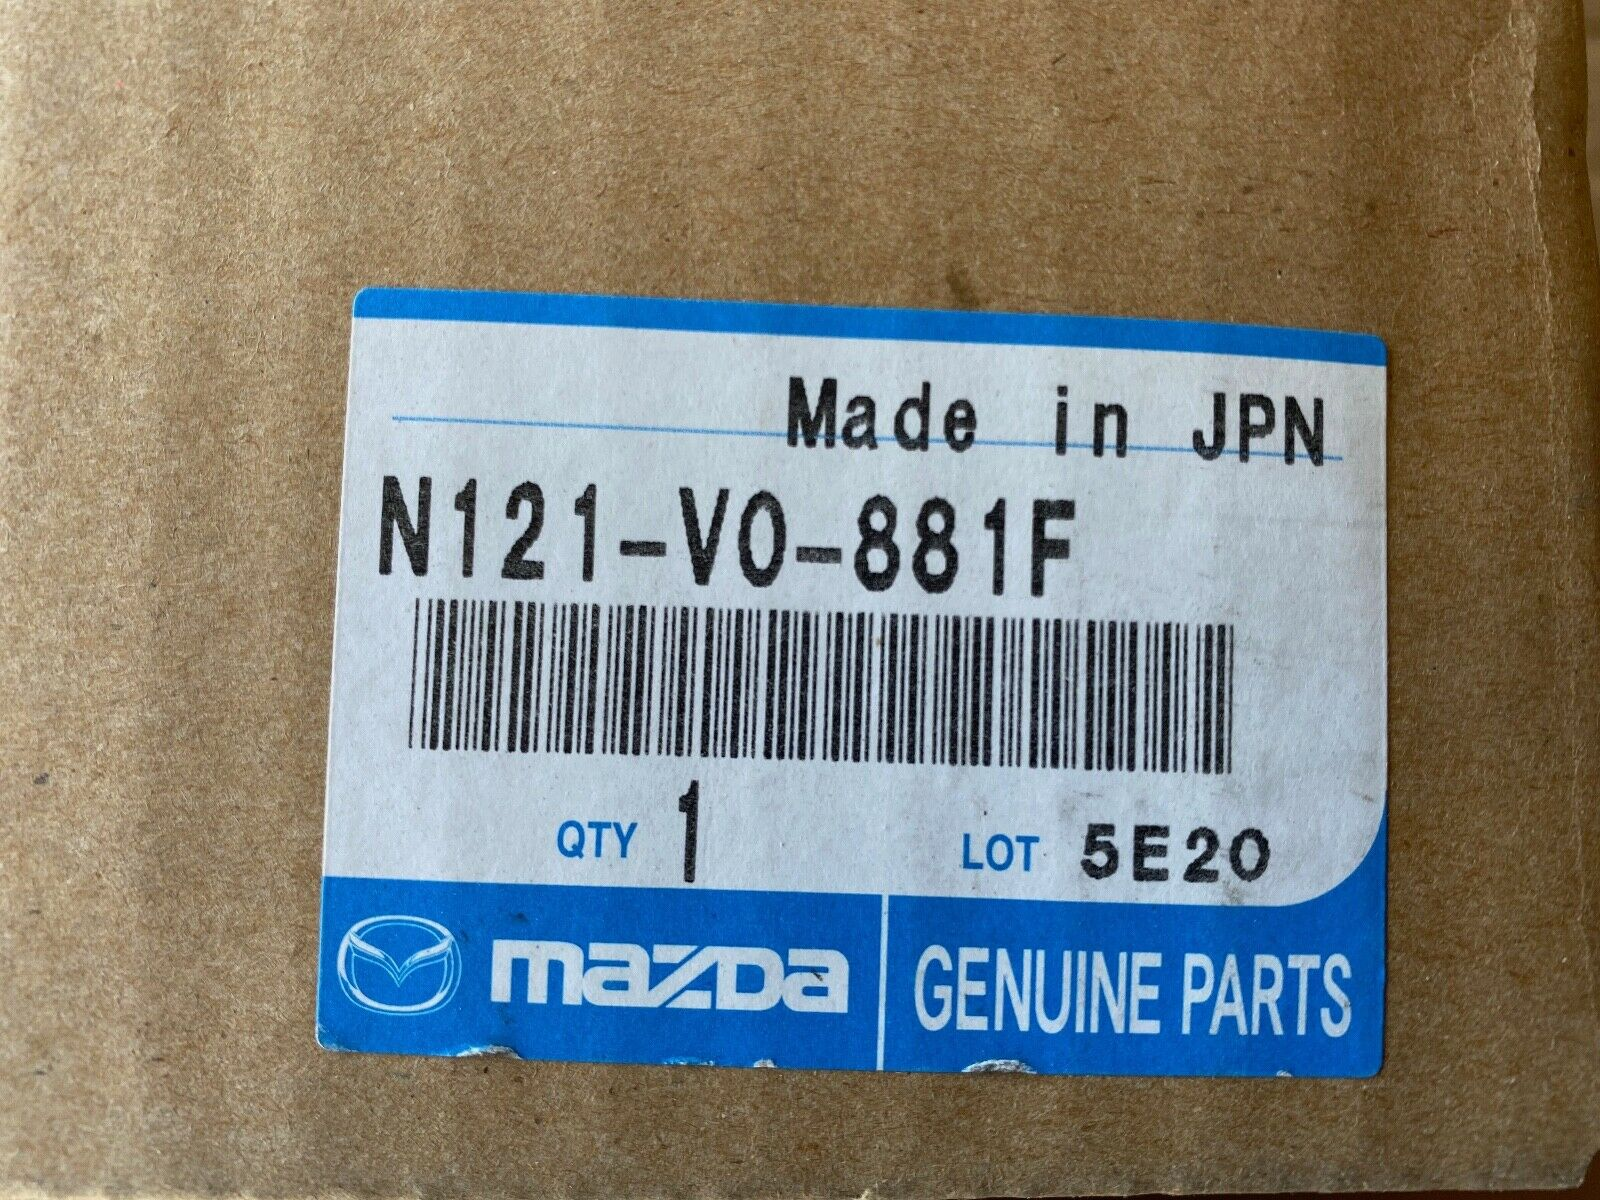 Mazda Genuine Accessories N121-V0-881F Ashtray